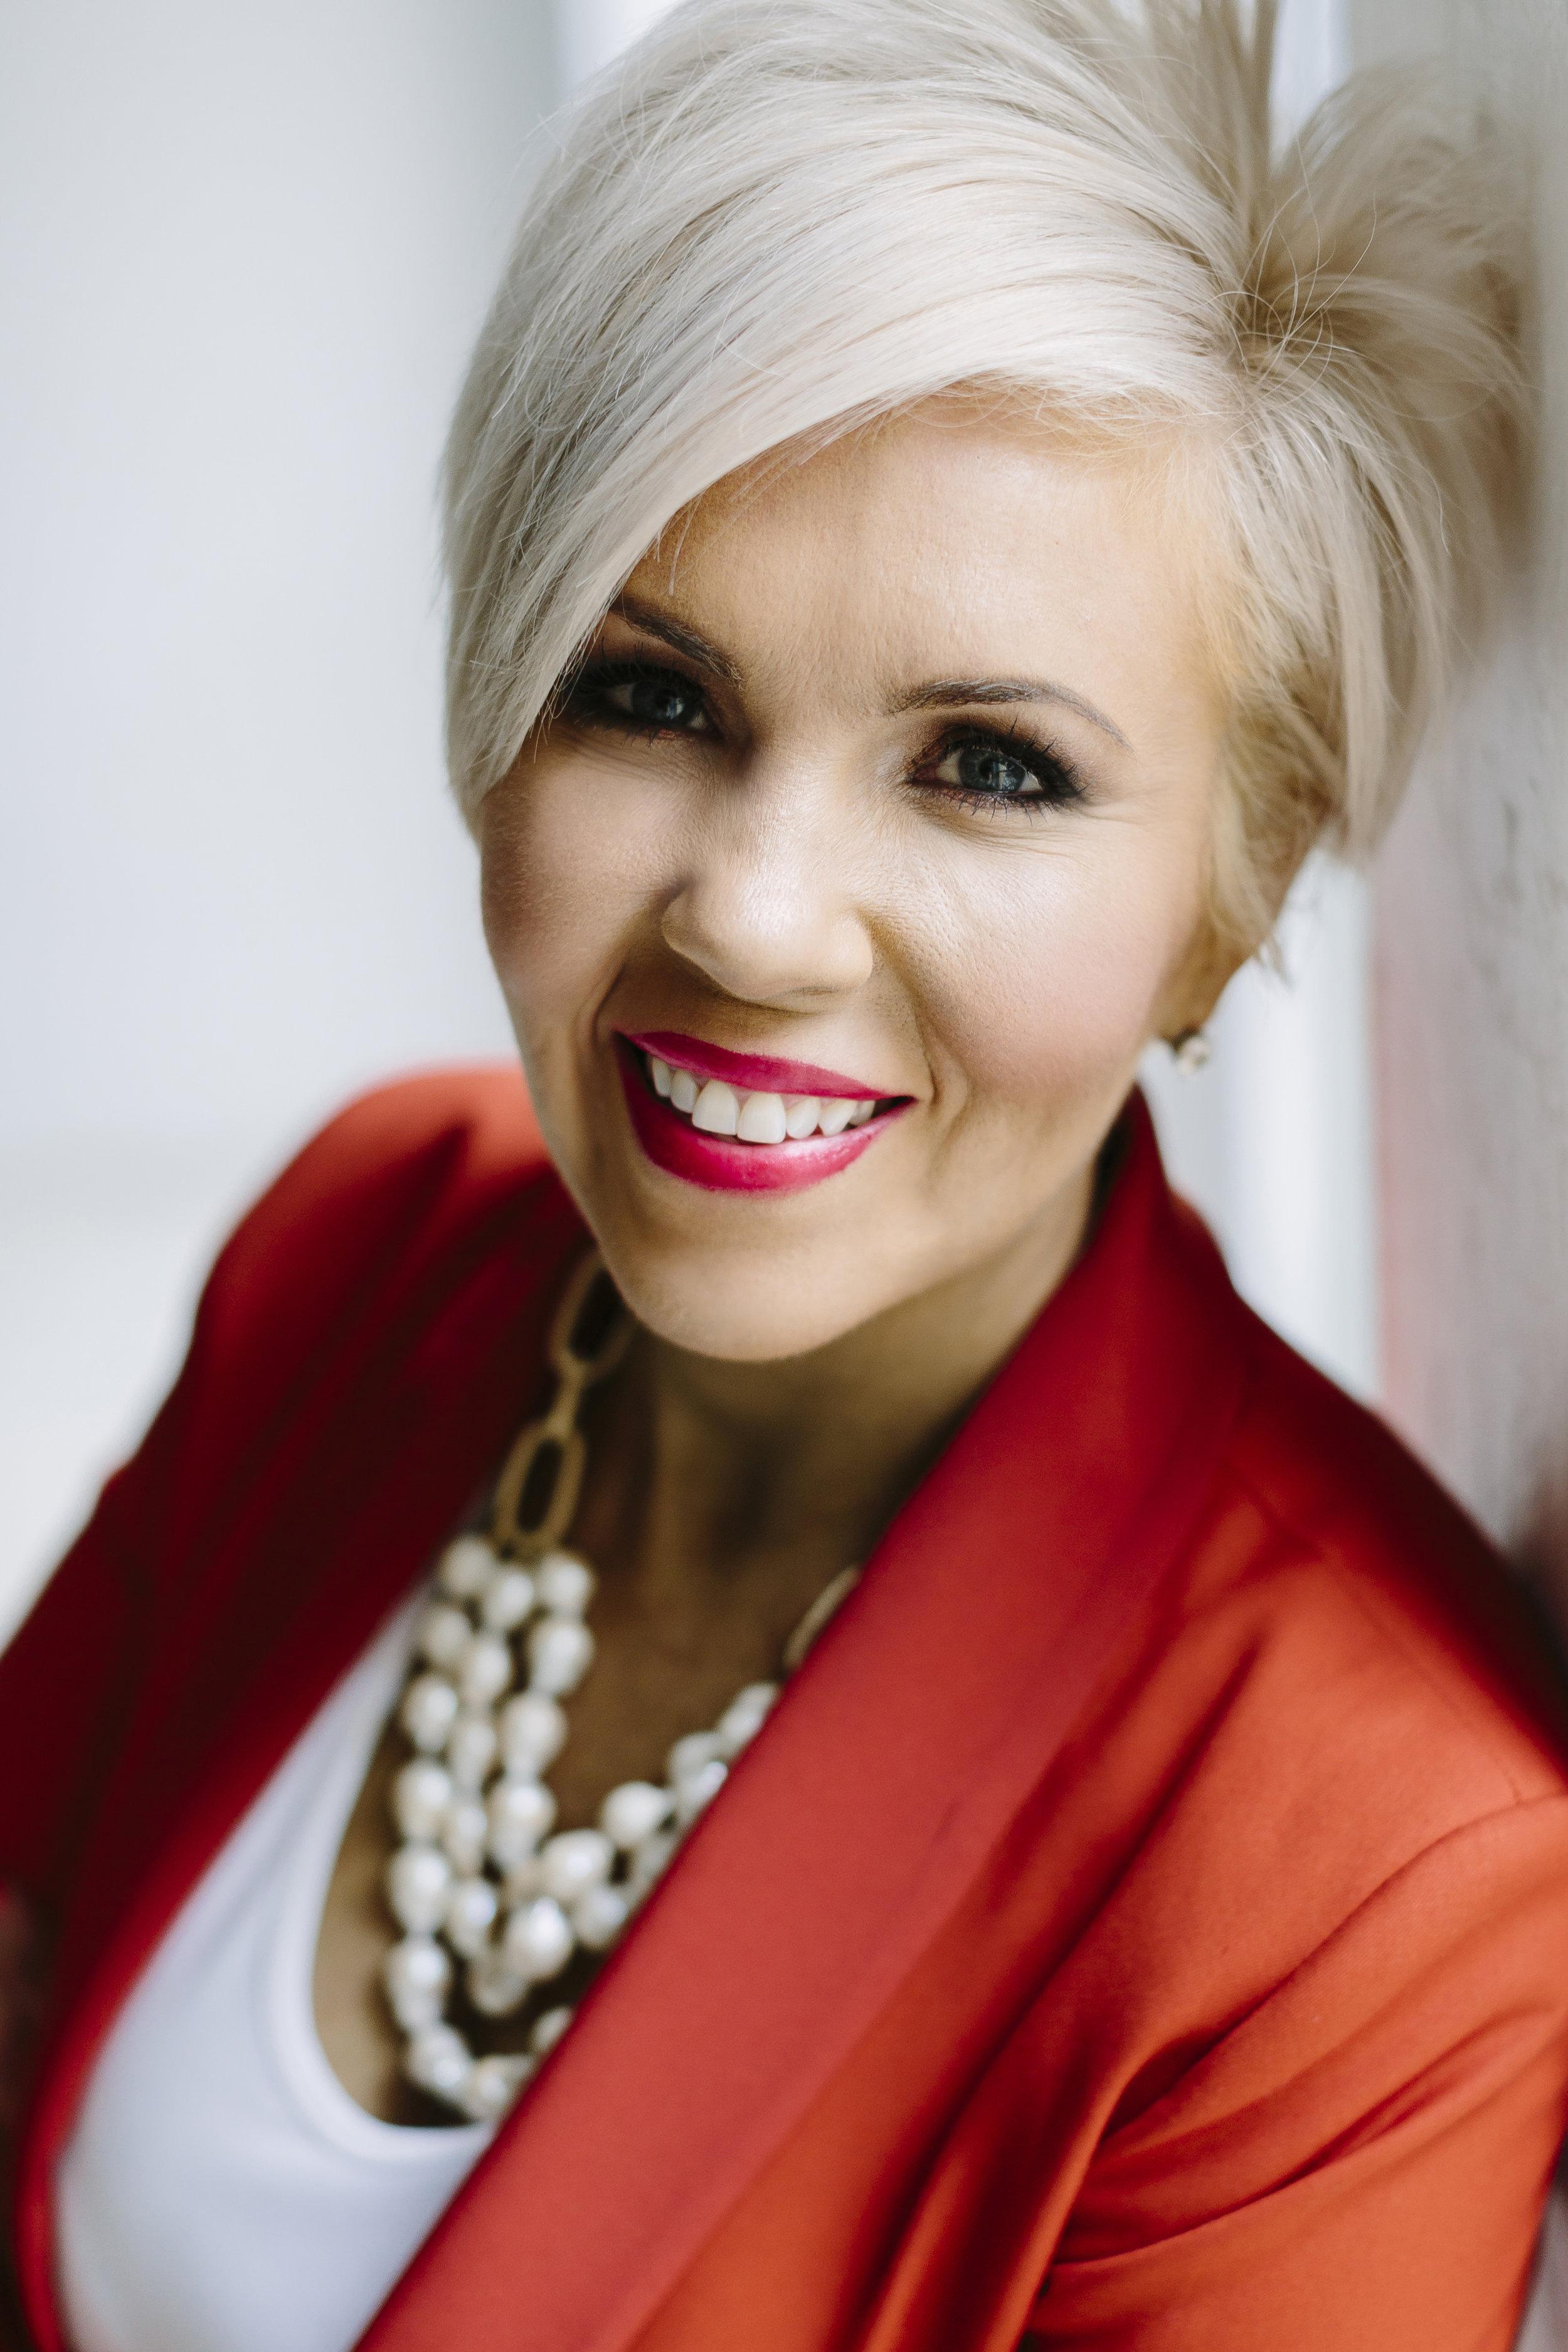 Influencer Expert | Author 5 Books on Branding & Communication | Certified Speaker | Mentor to Female Industry Leaders